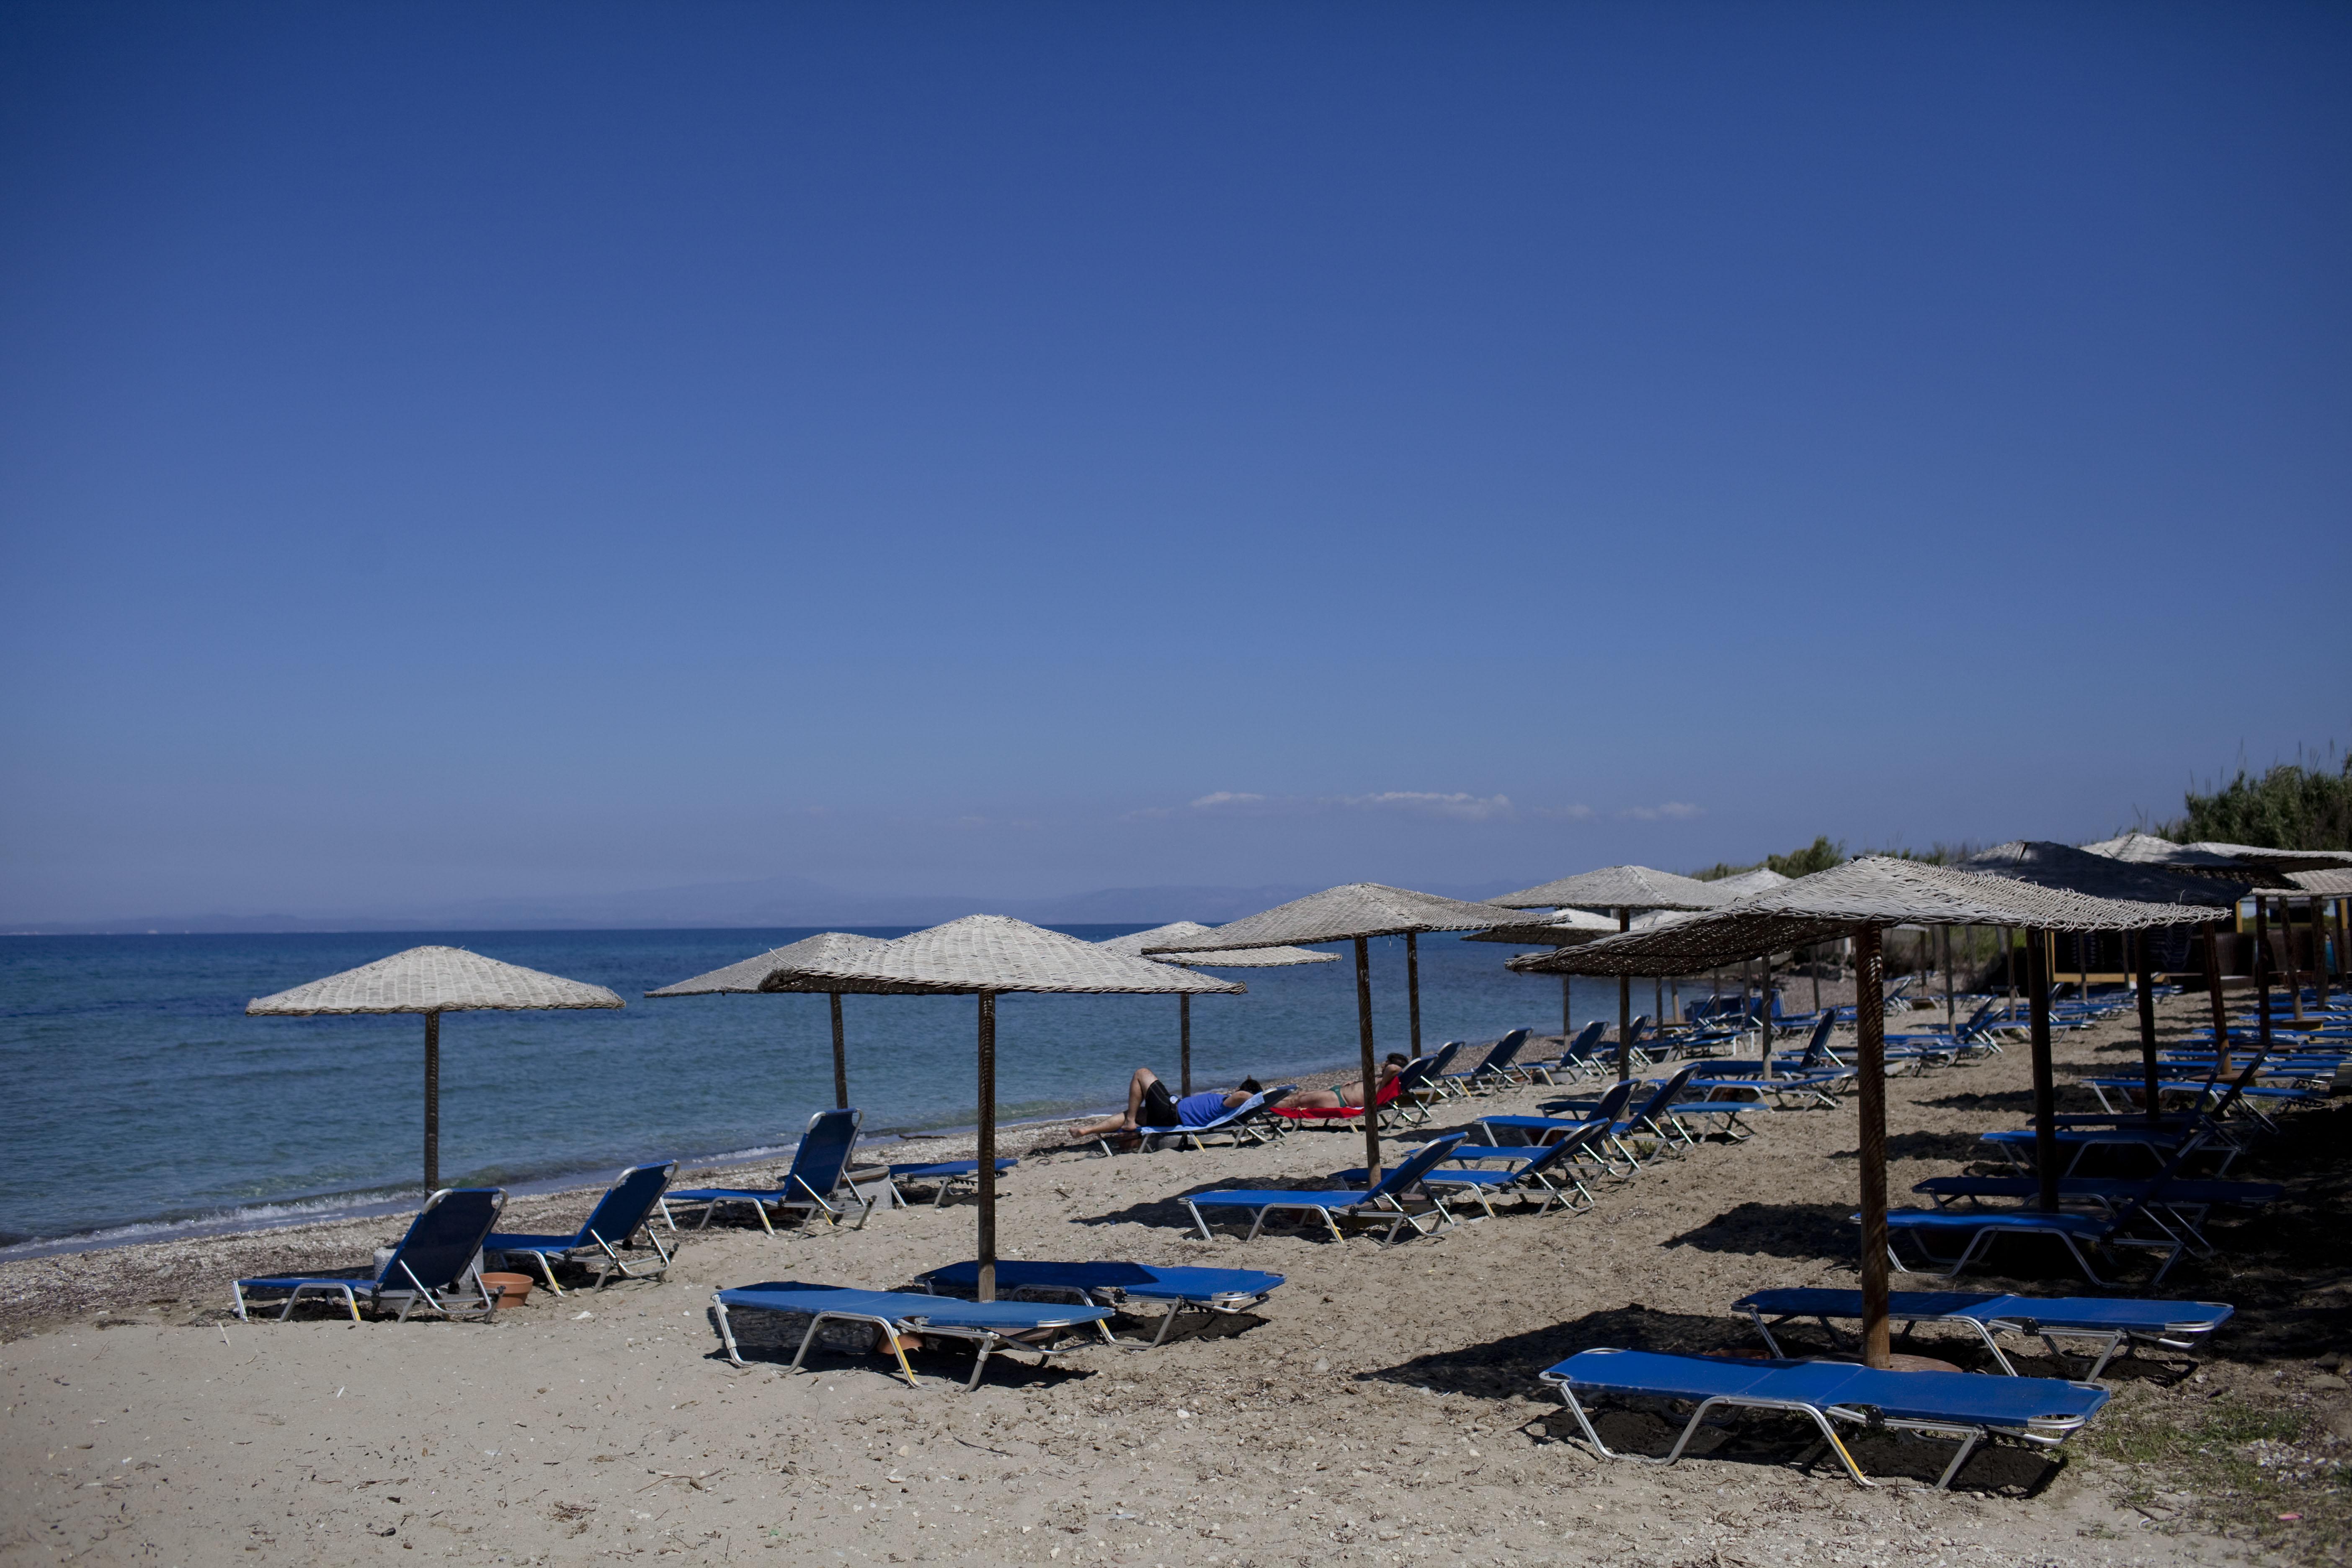 Greek Economic Crisis Threatens Tourist Industry